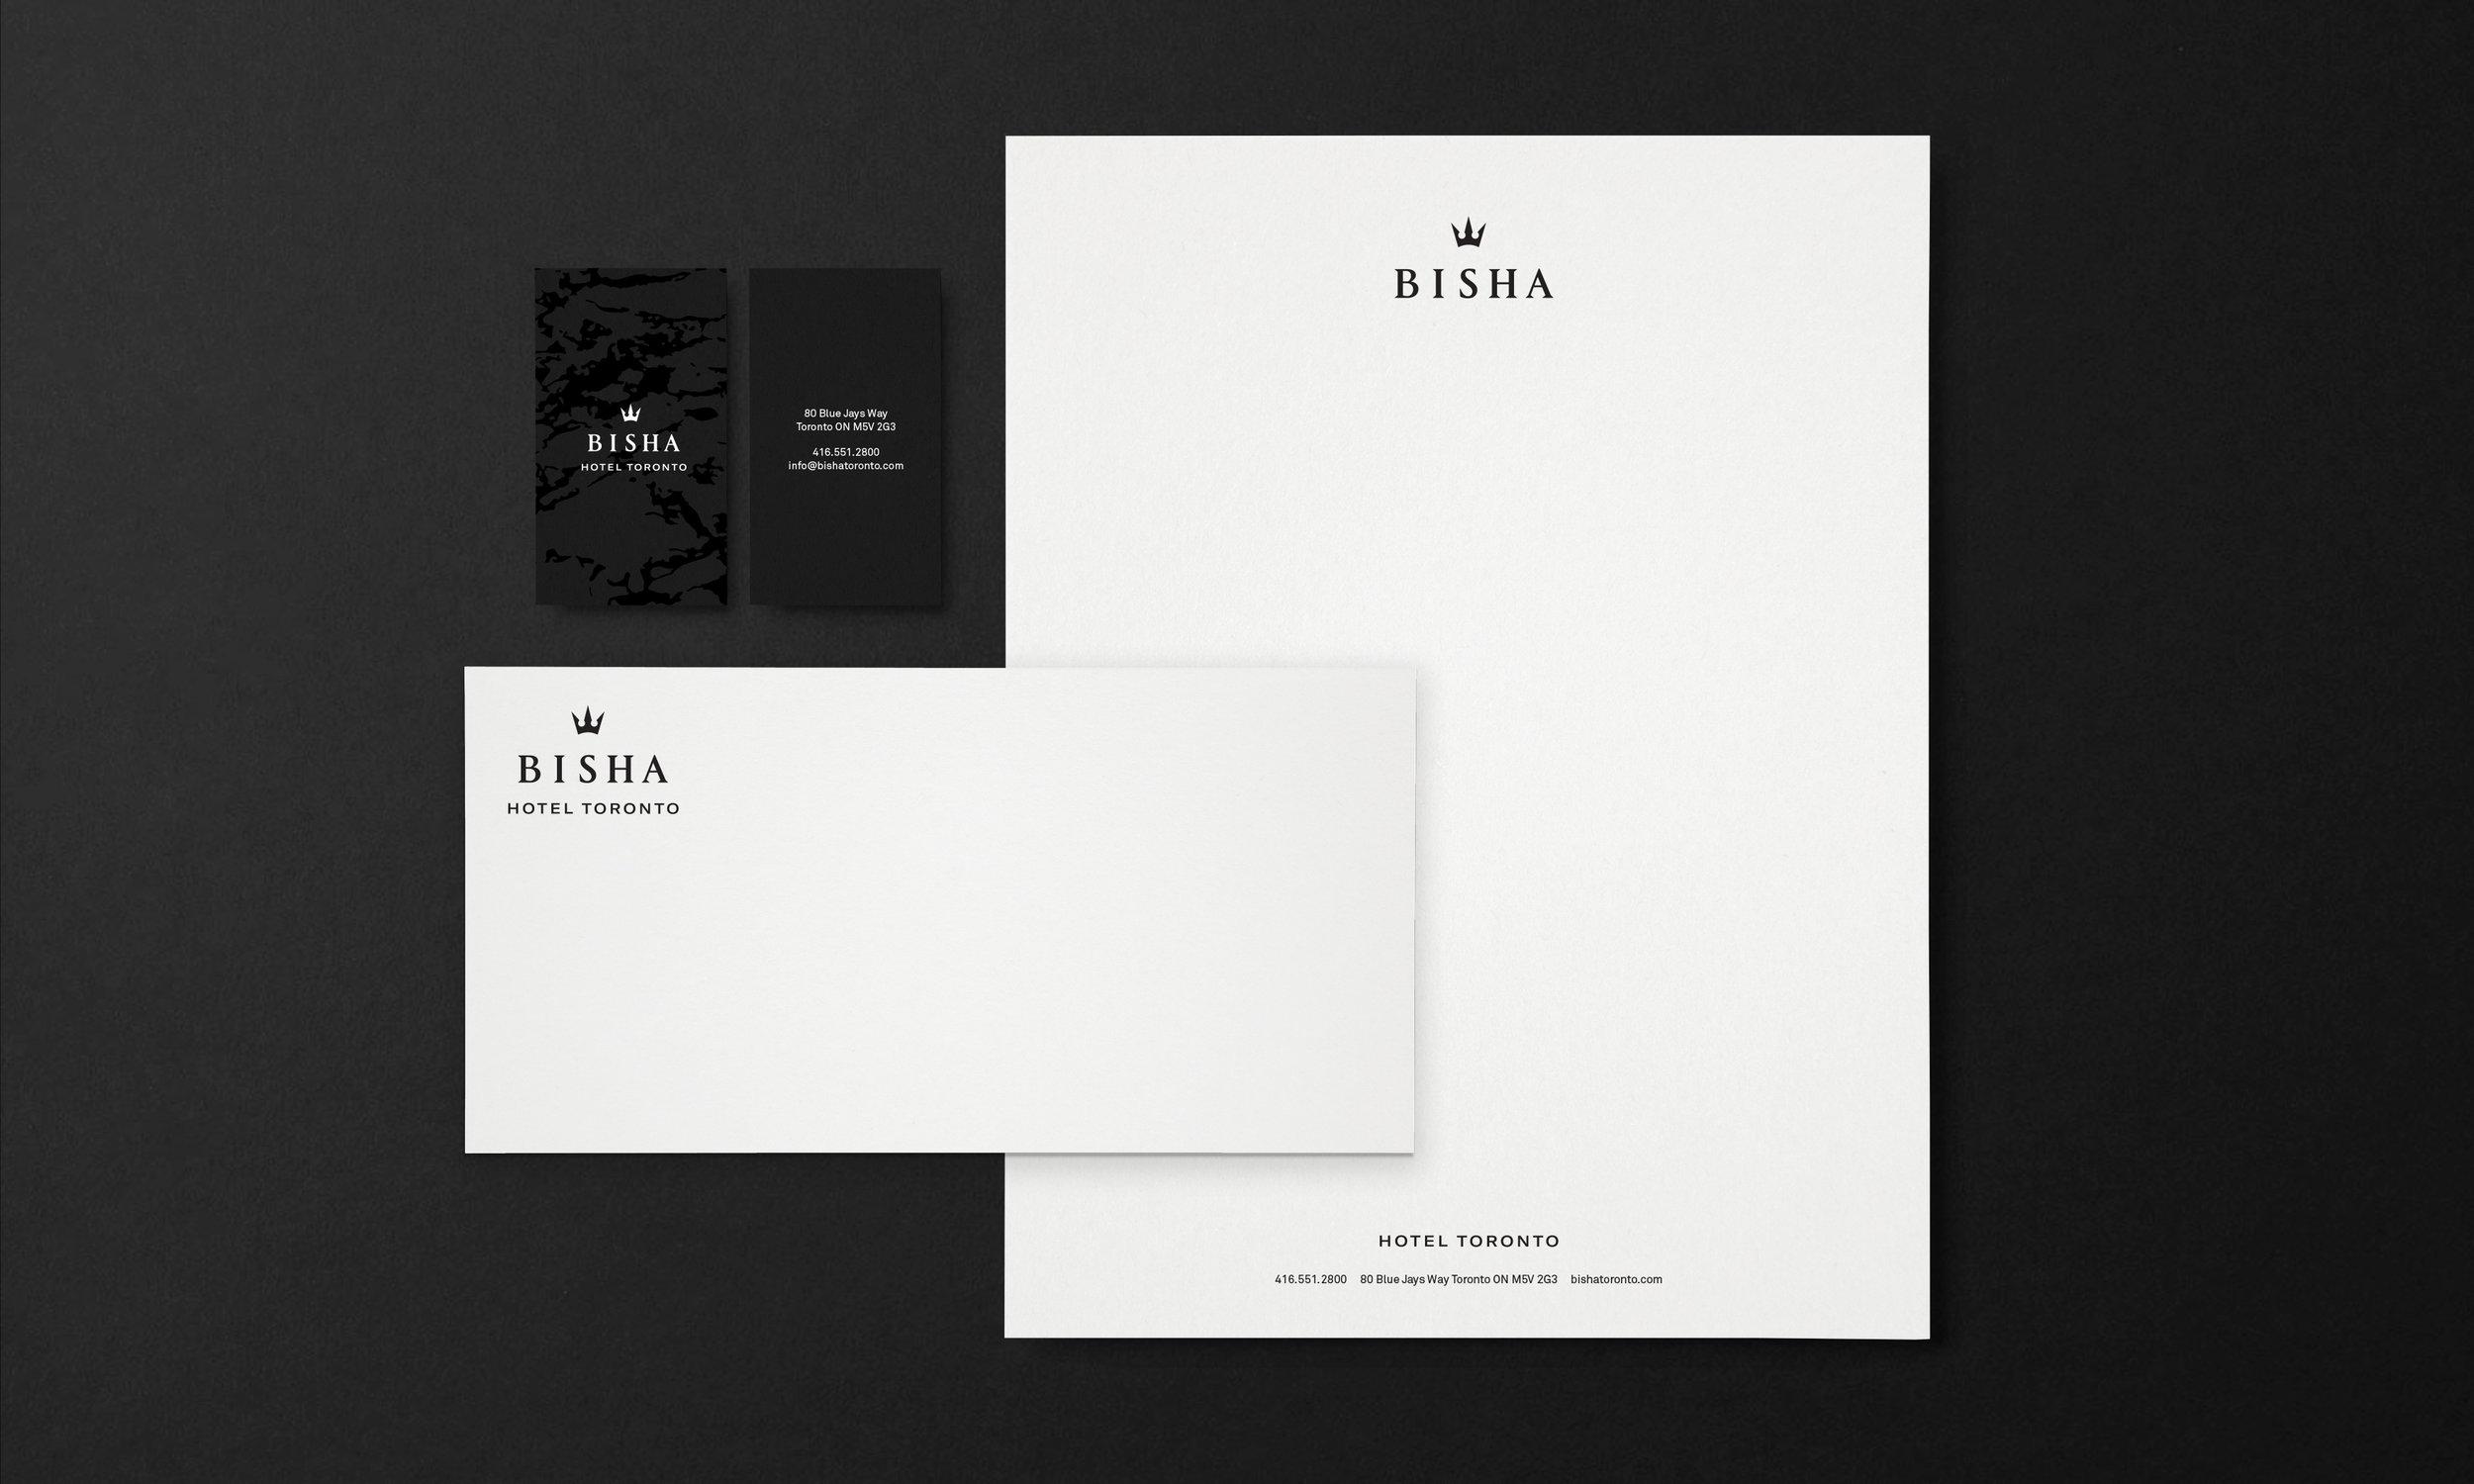 Bisha-CaseStudy-Stationery.jpg